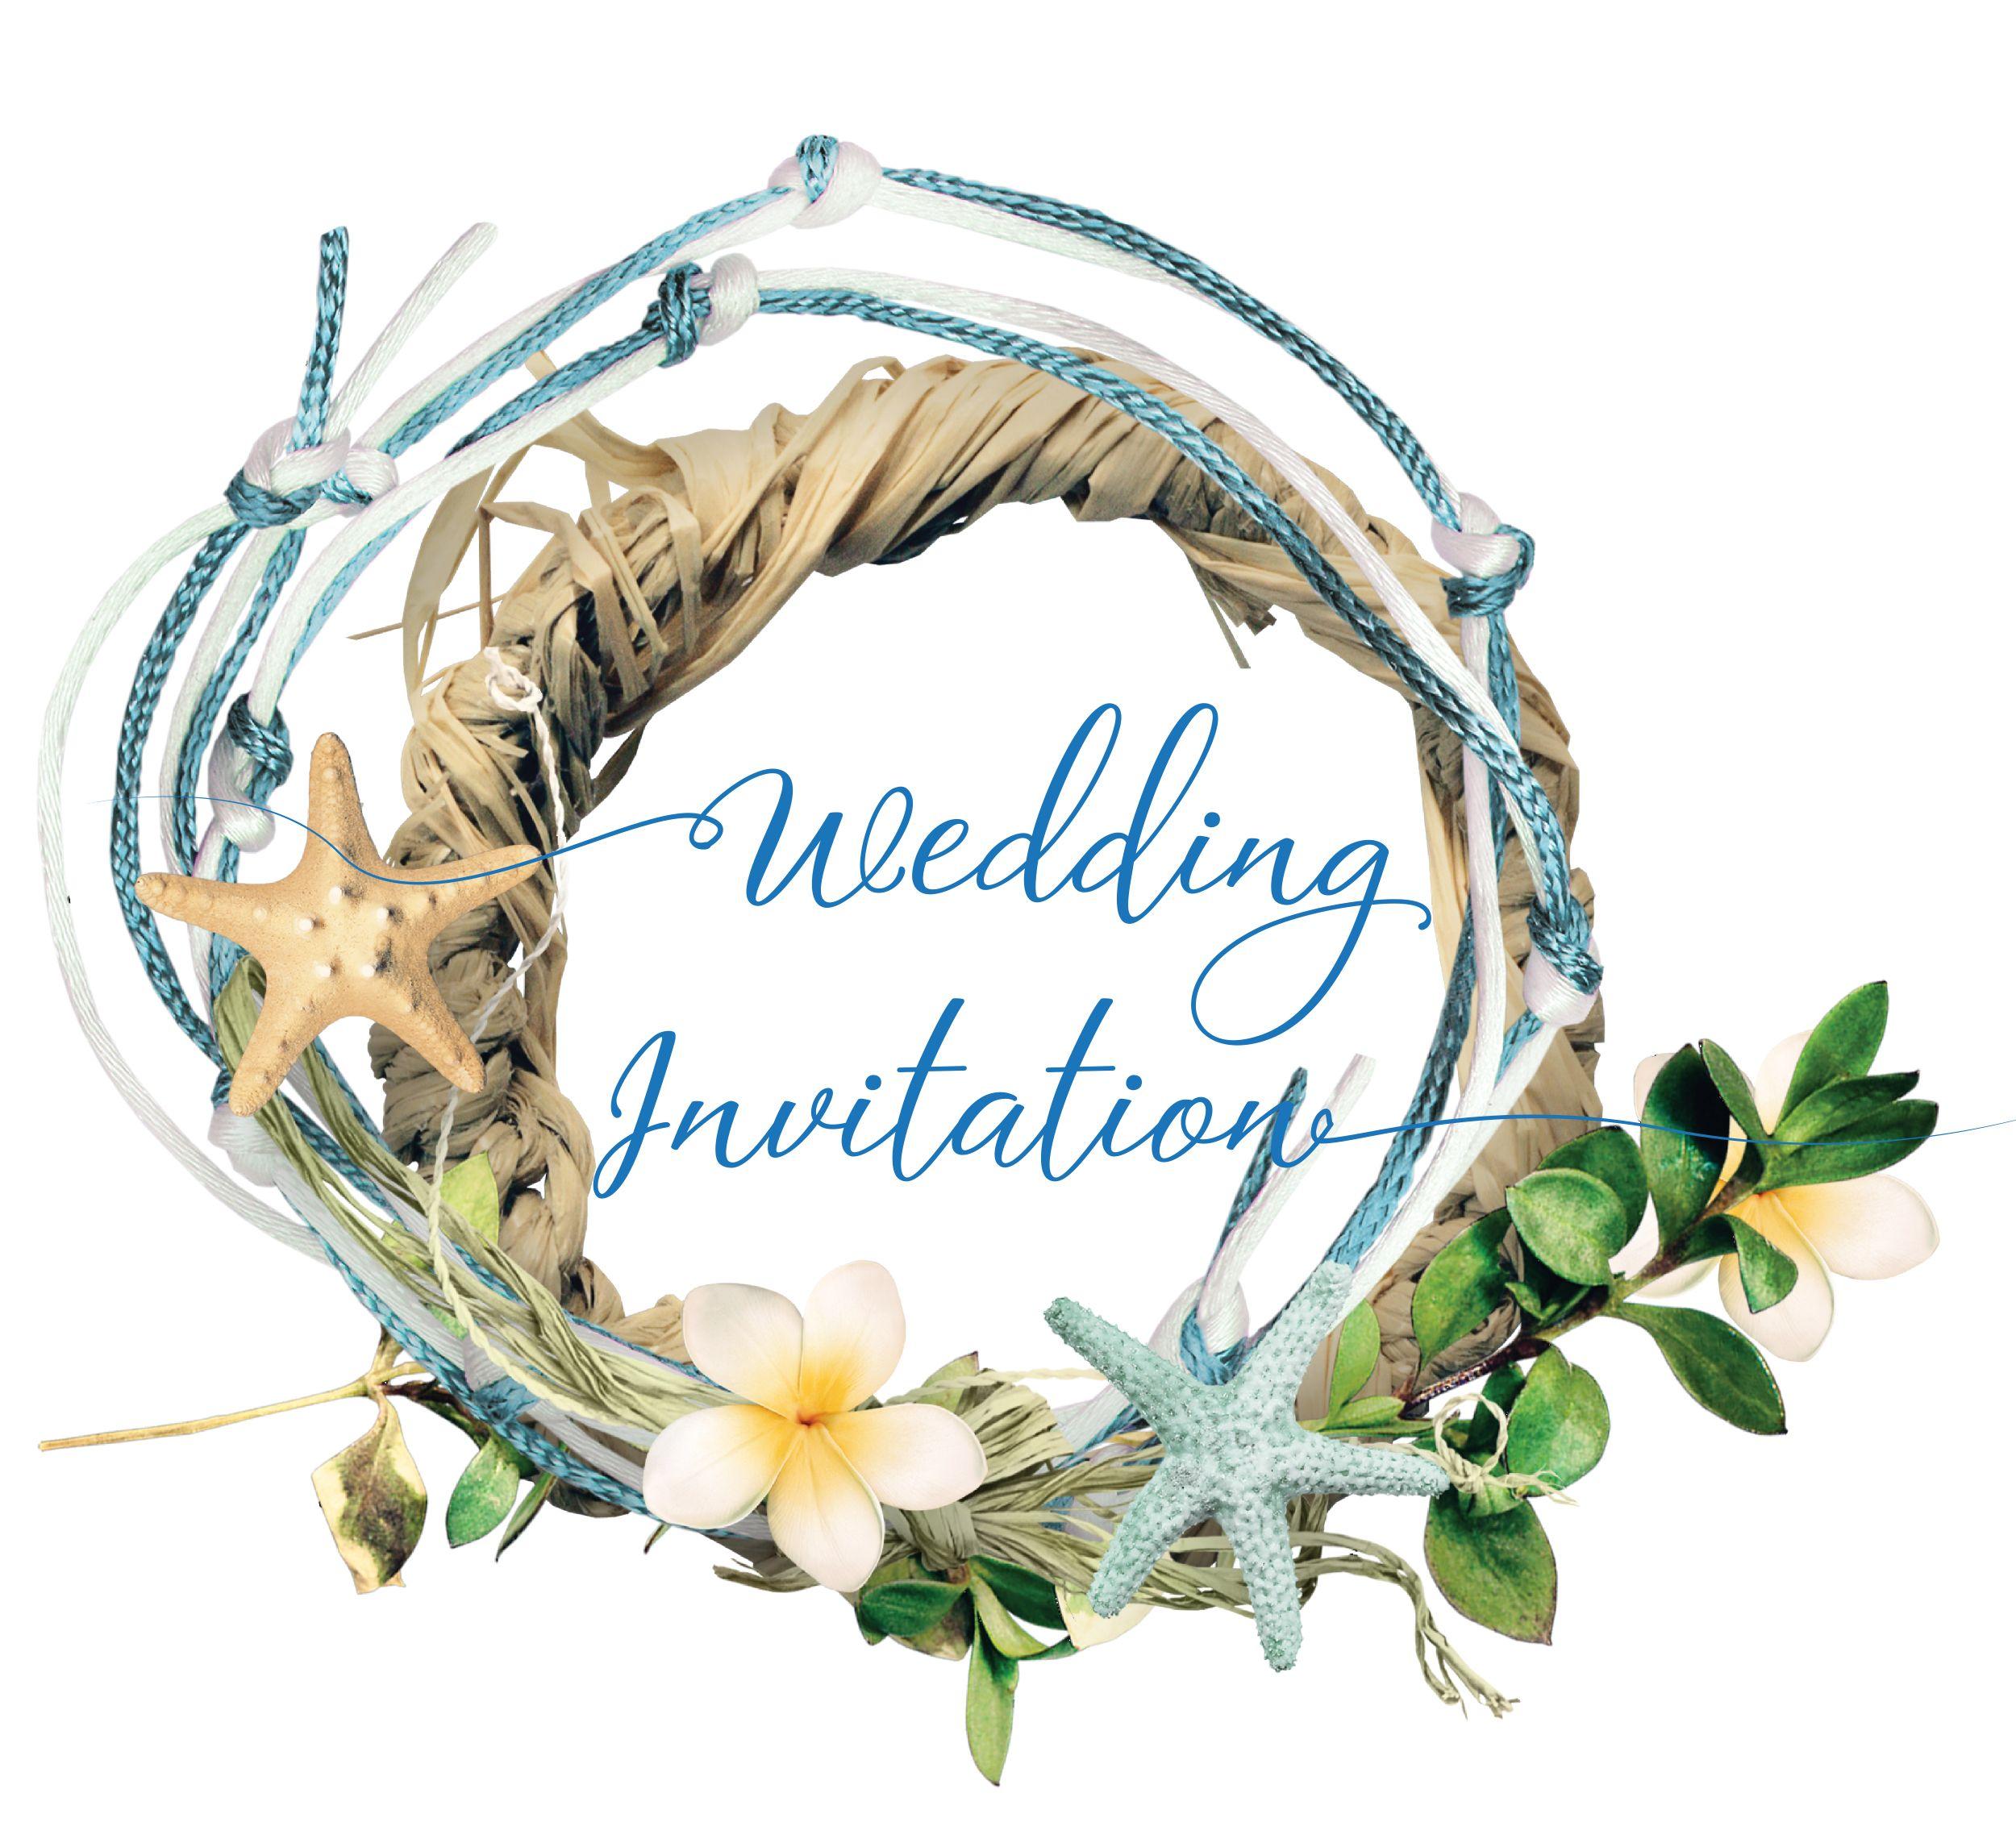 Wedding Invitation With Wreath Starfish And Flower